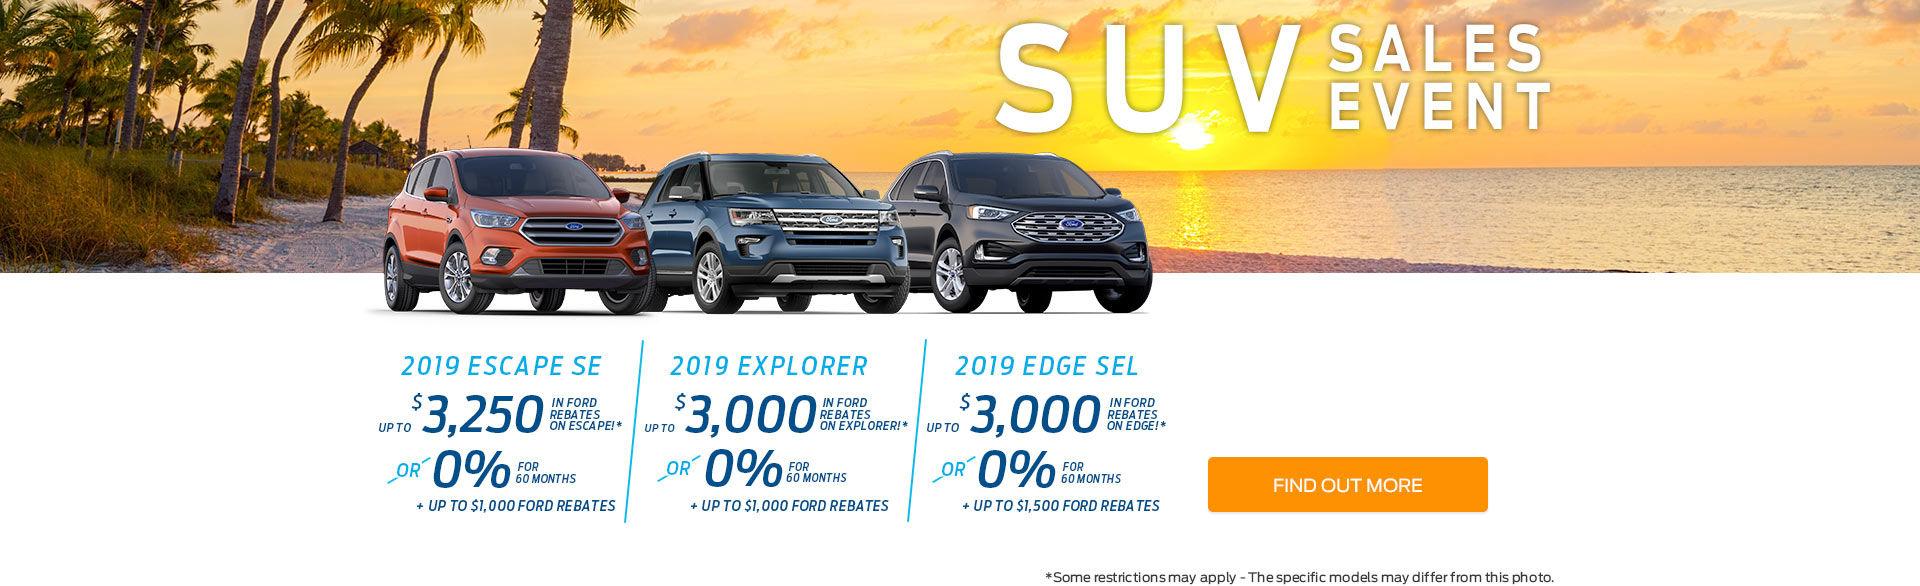 SUV Sales Event